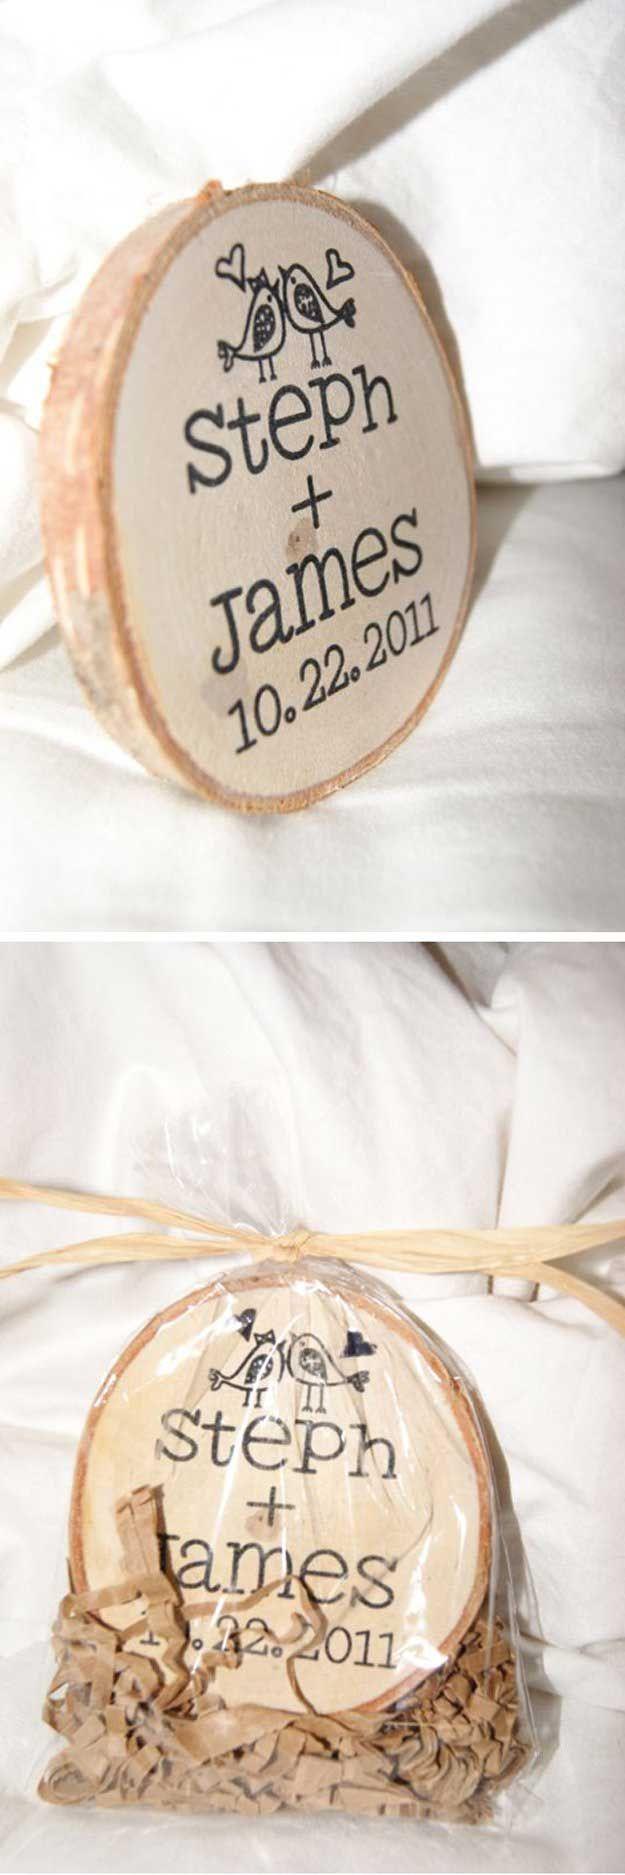 Wooden magnet favors diy wedding favor ideas moneysaving